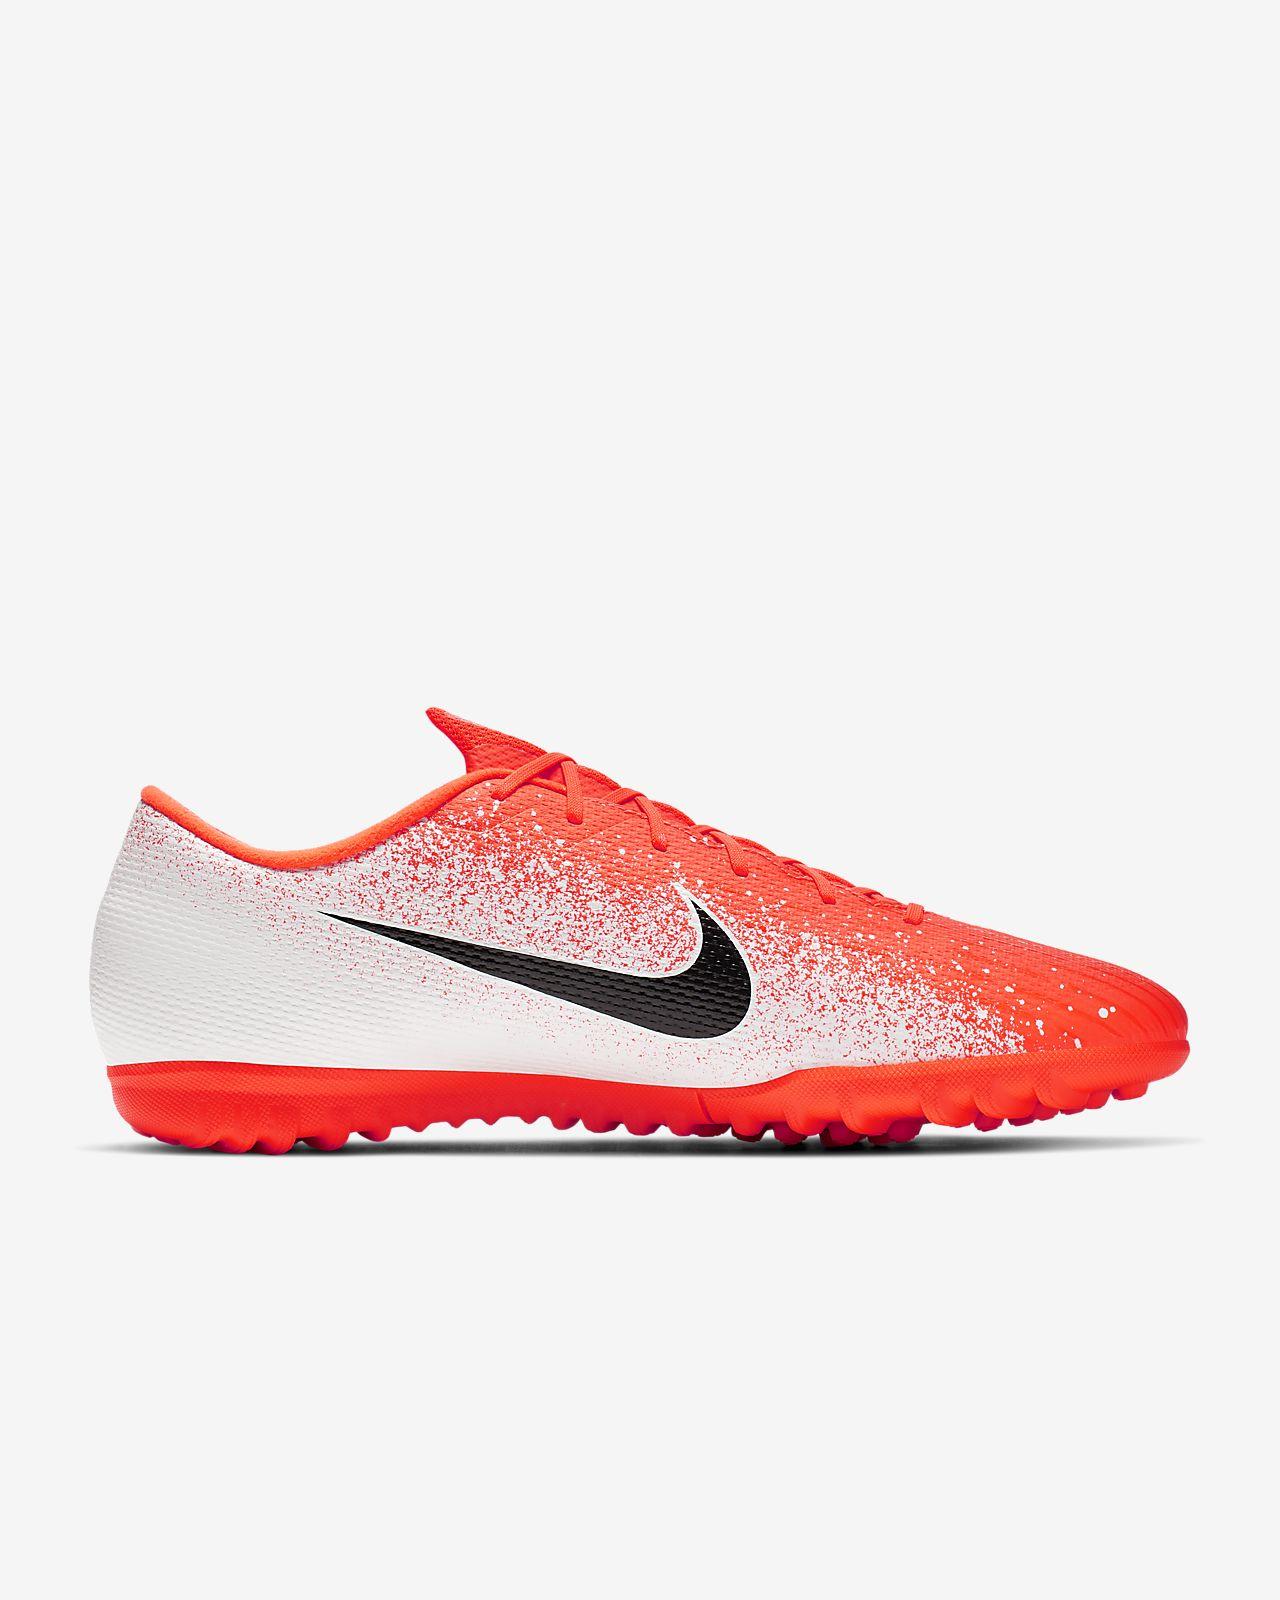 Nike 12 Academy Football Tf À Surface Vaporx Crampons Pour Synthétique De Chaussure IDYb9eHW2E